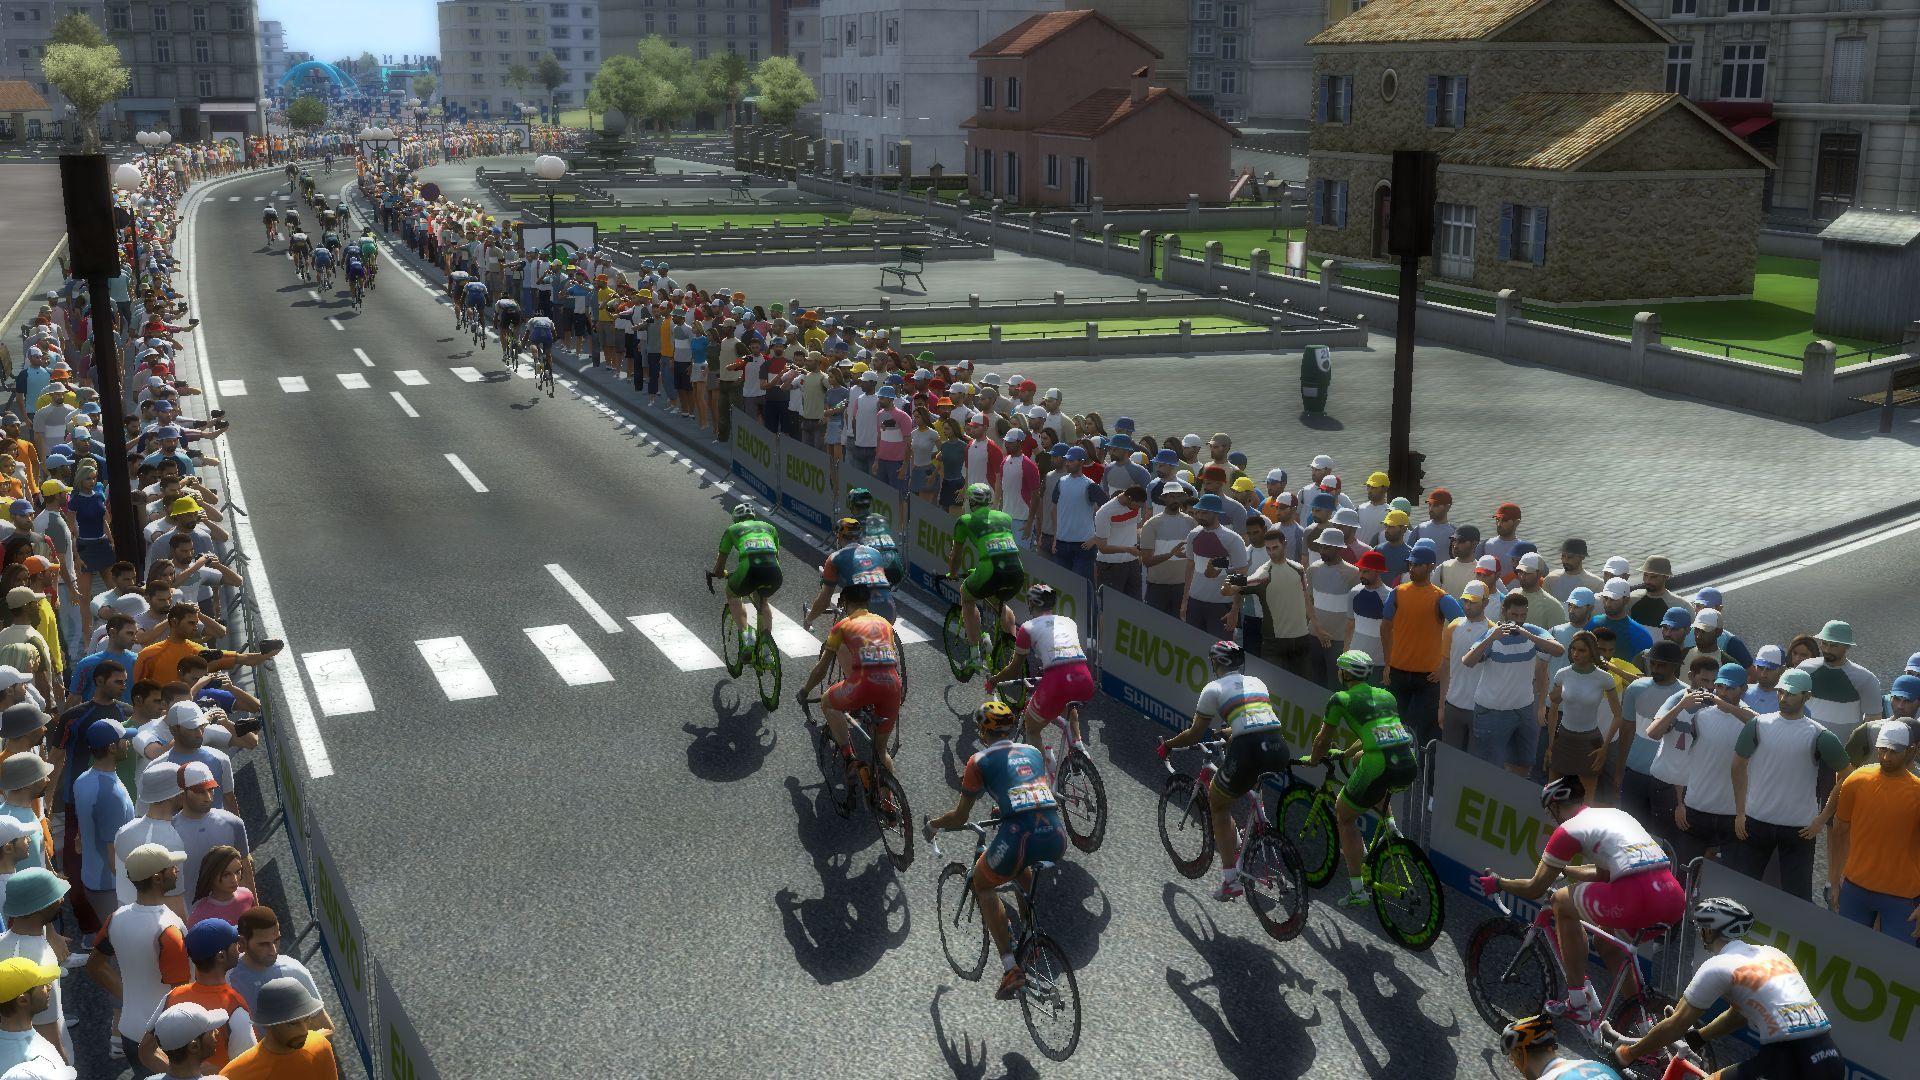 pcmdaily.com/images/mg/2017/Races/PTHC/LisbonClassic/Lisbon22.jpg